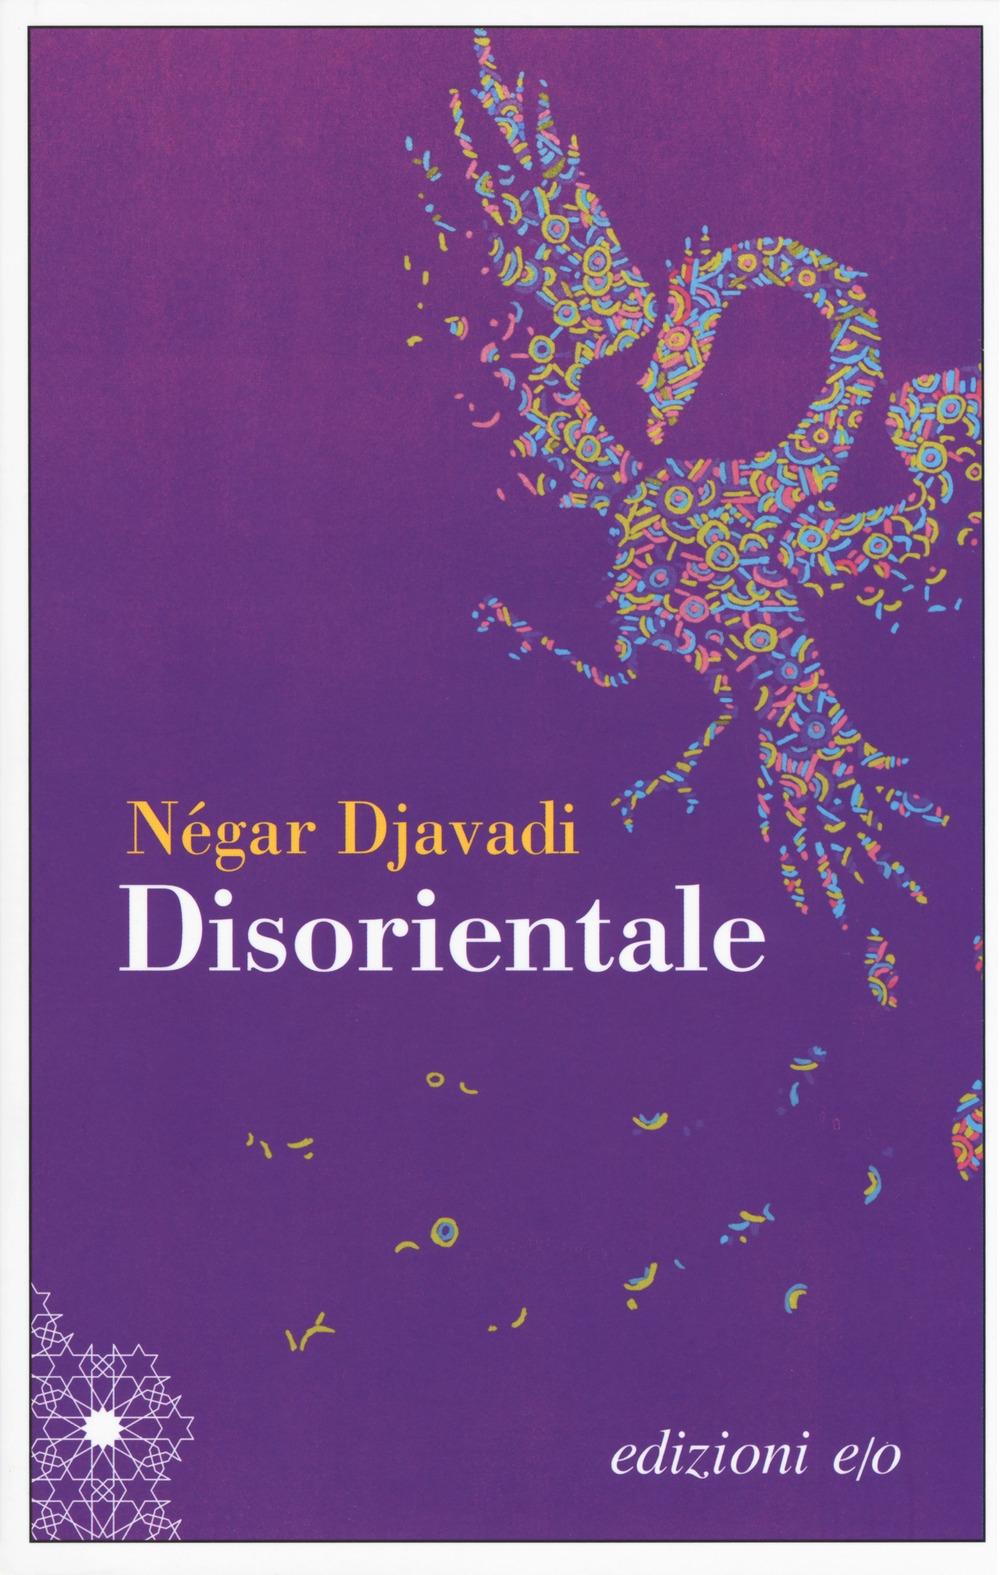 Disorientale